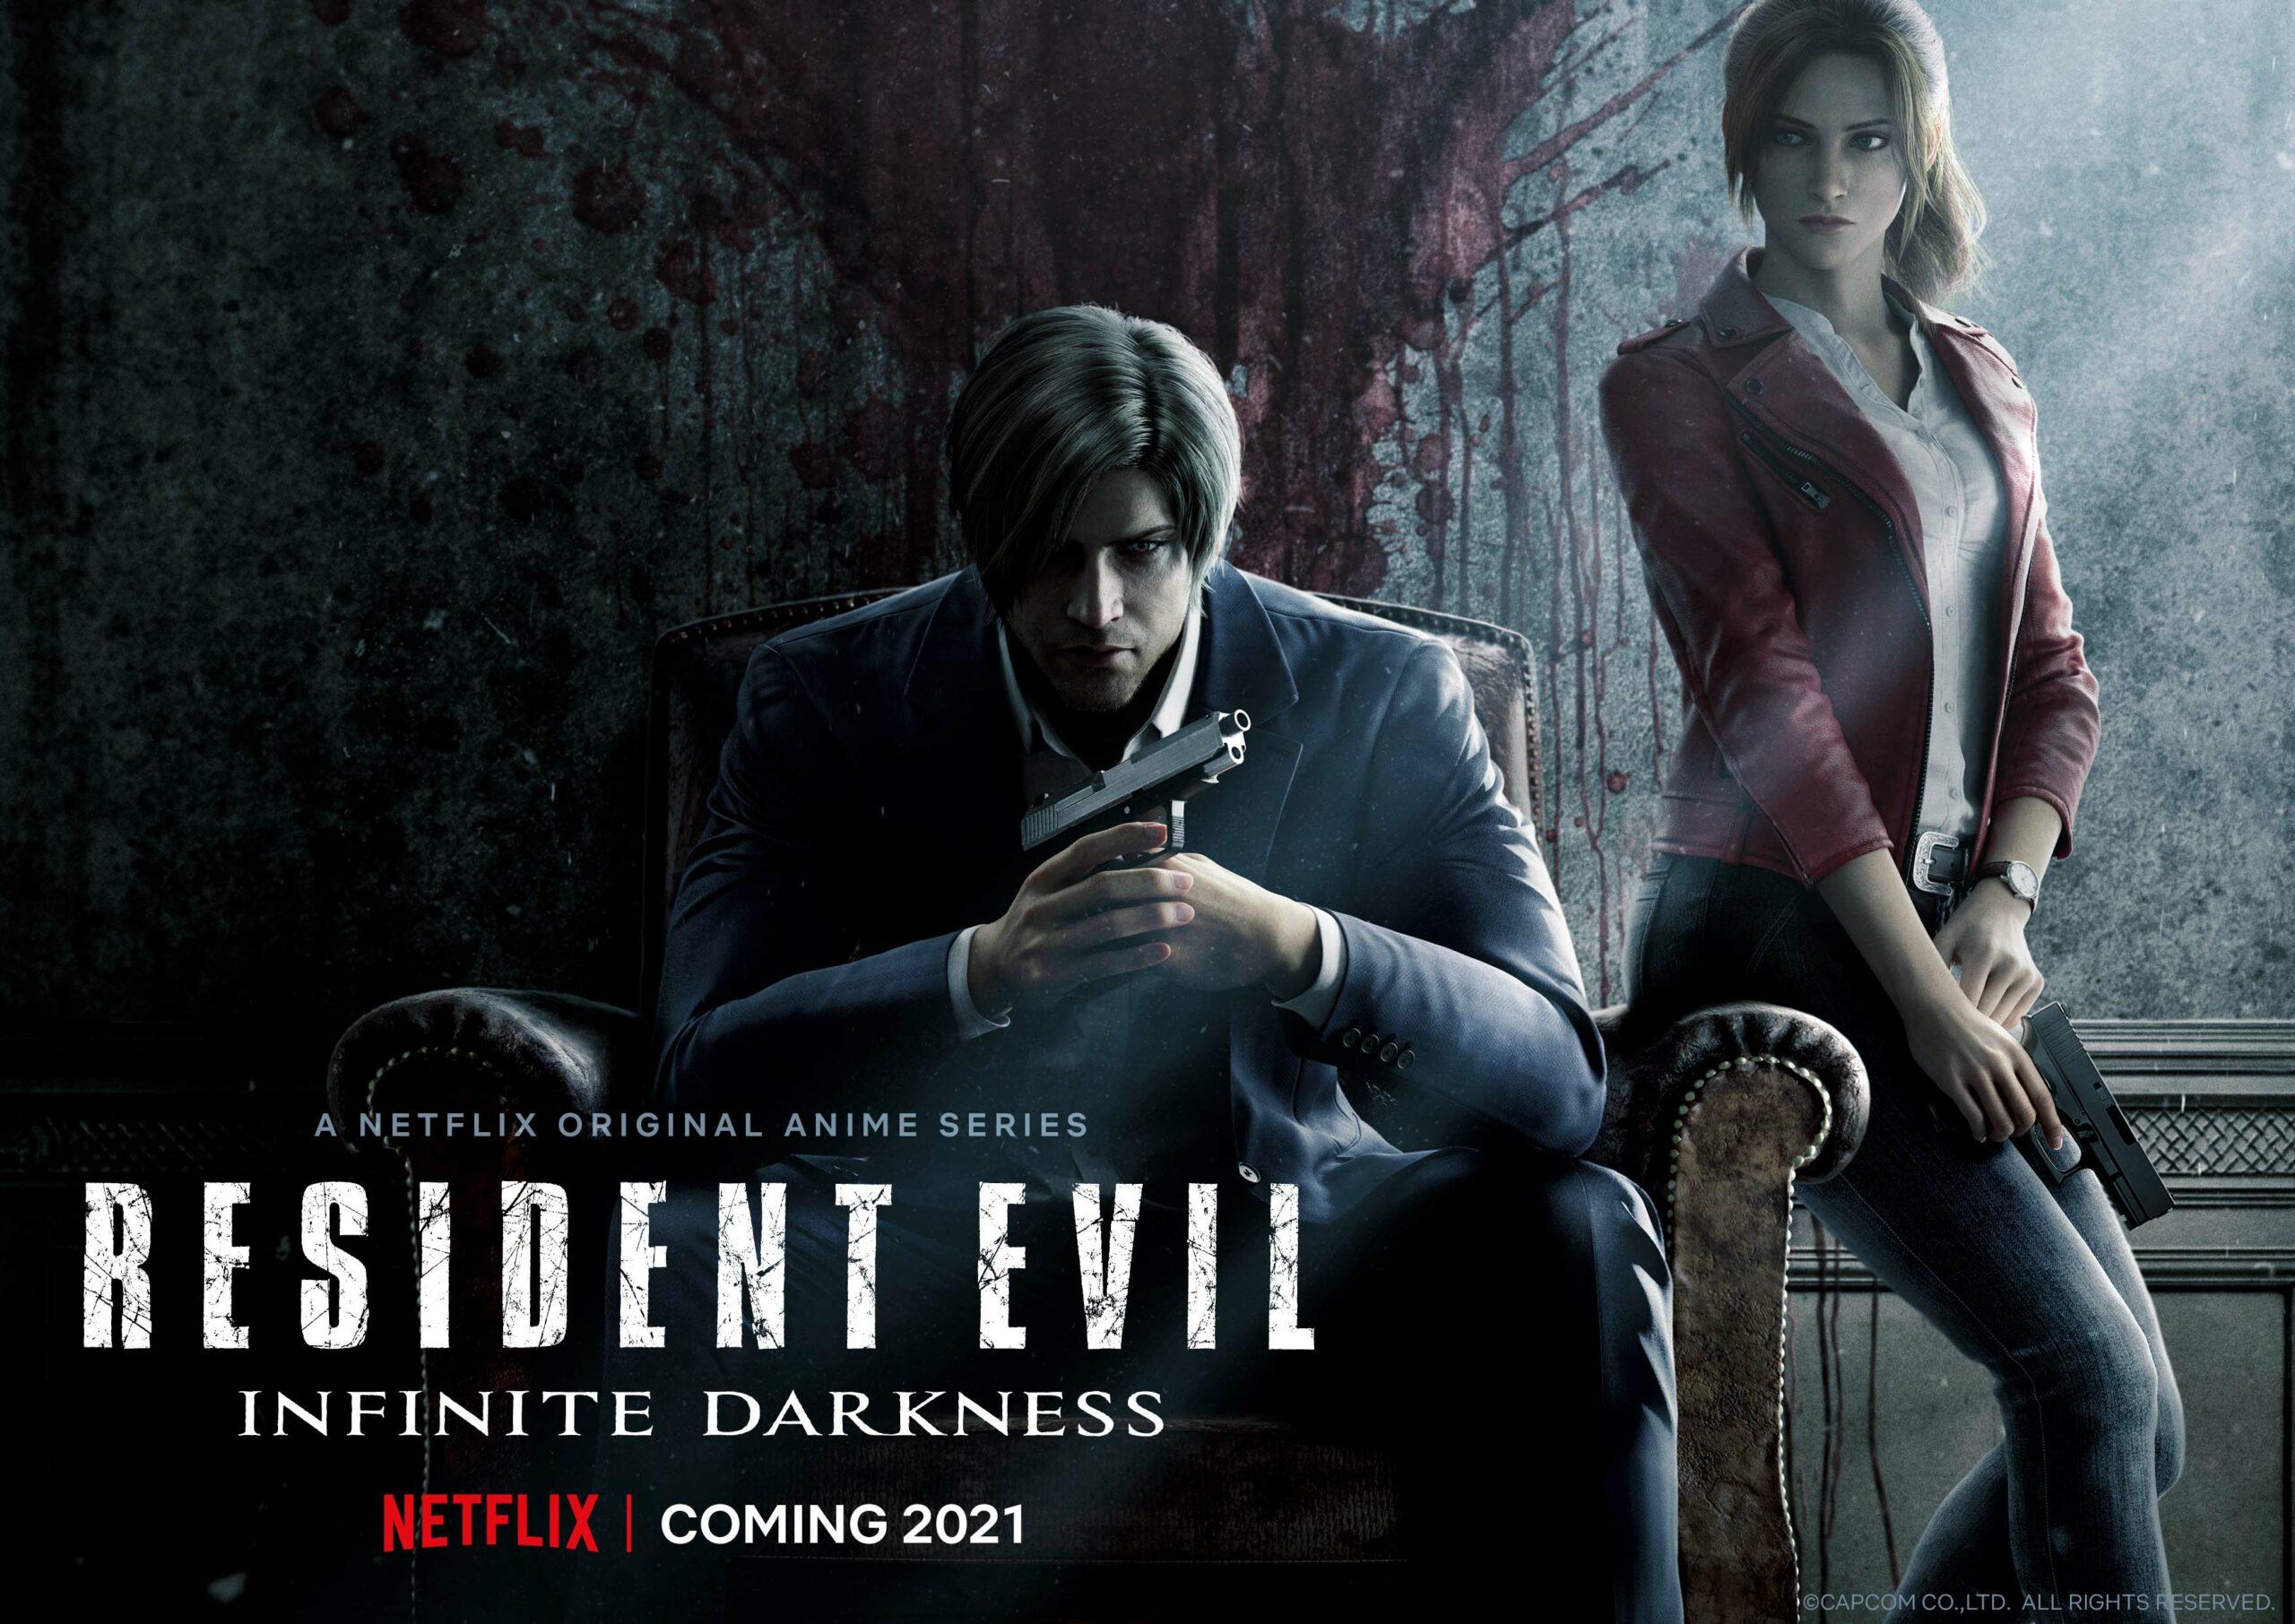 Resident Evil Infinite Darkness Cg Series Coming To Netflix In 2021 Gematsu